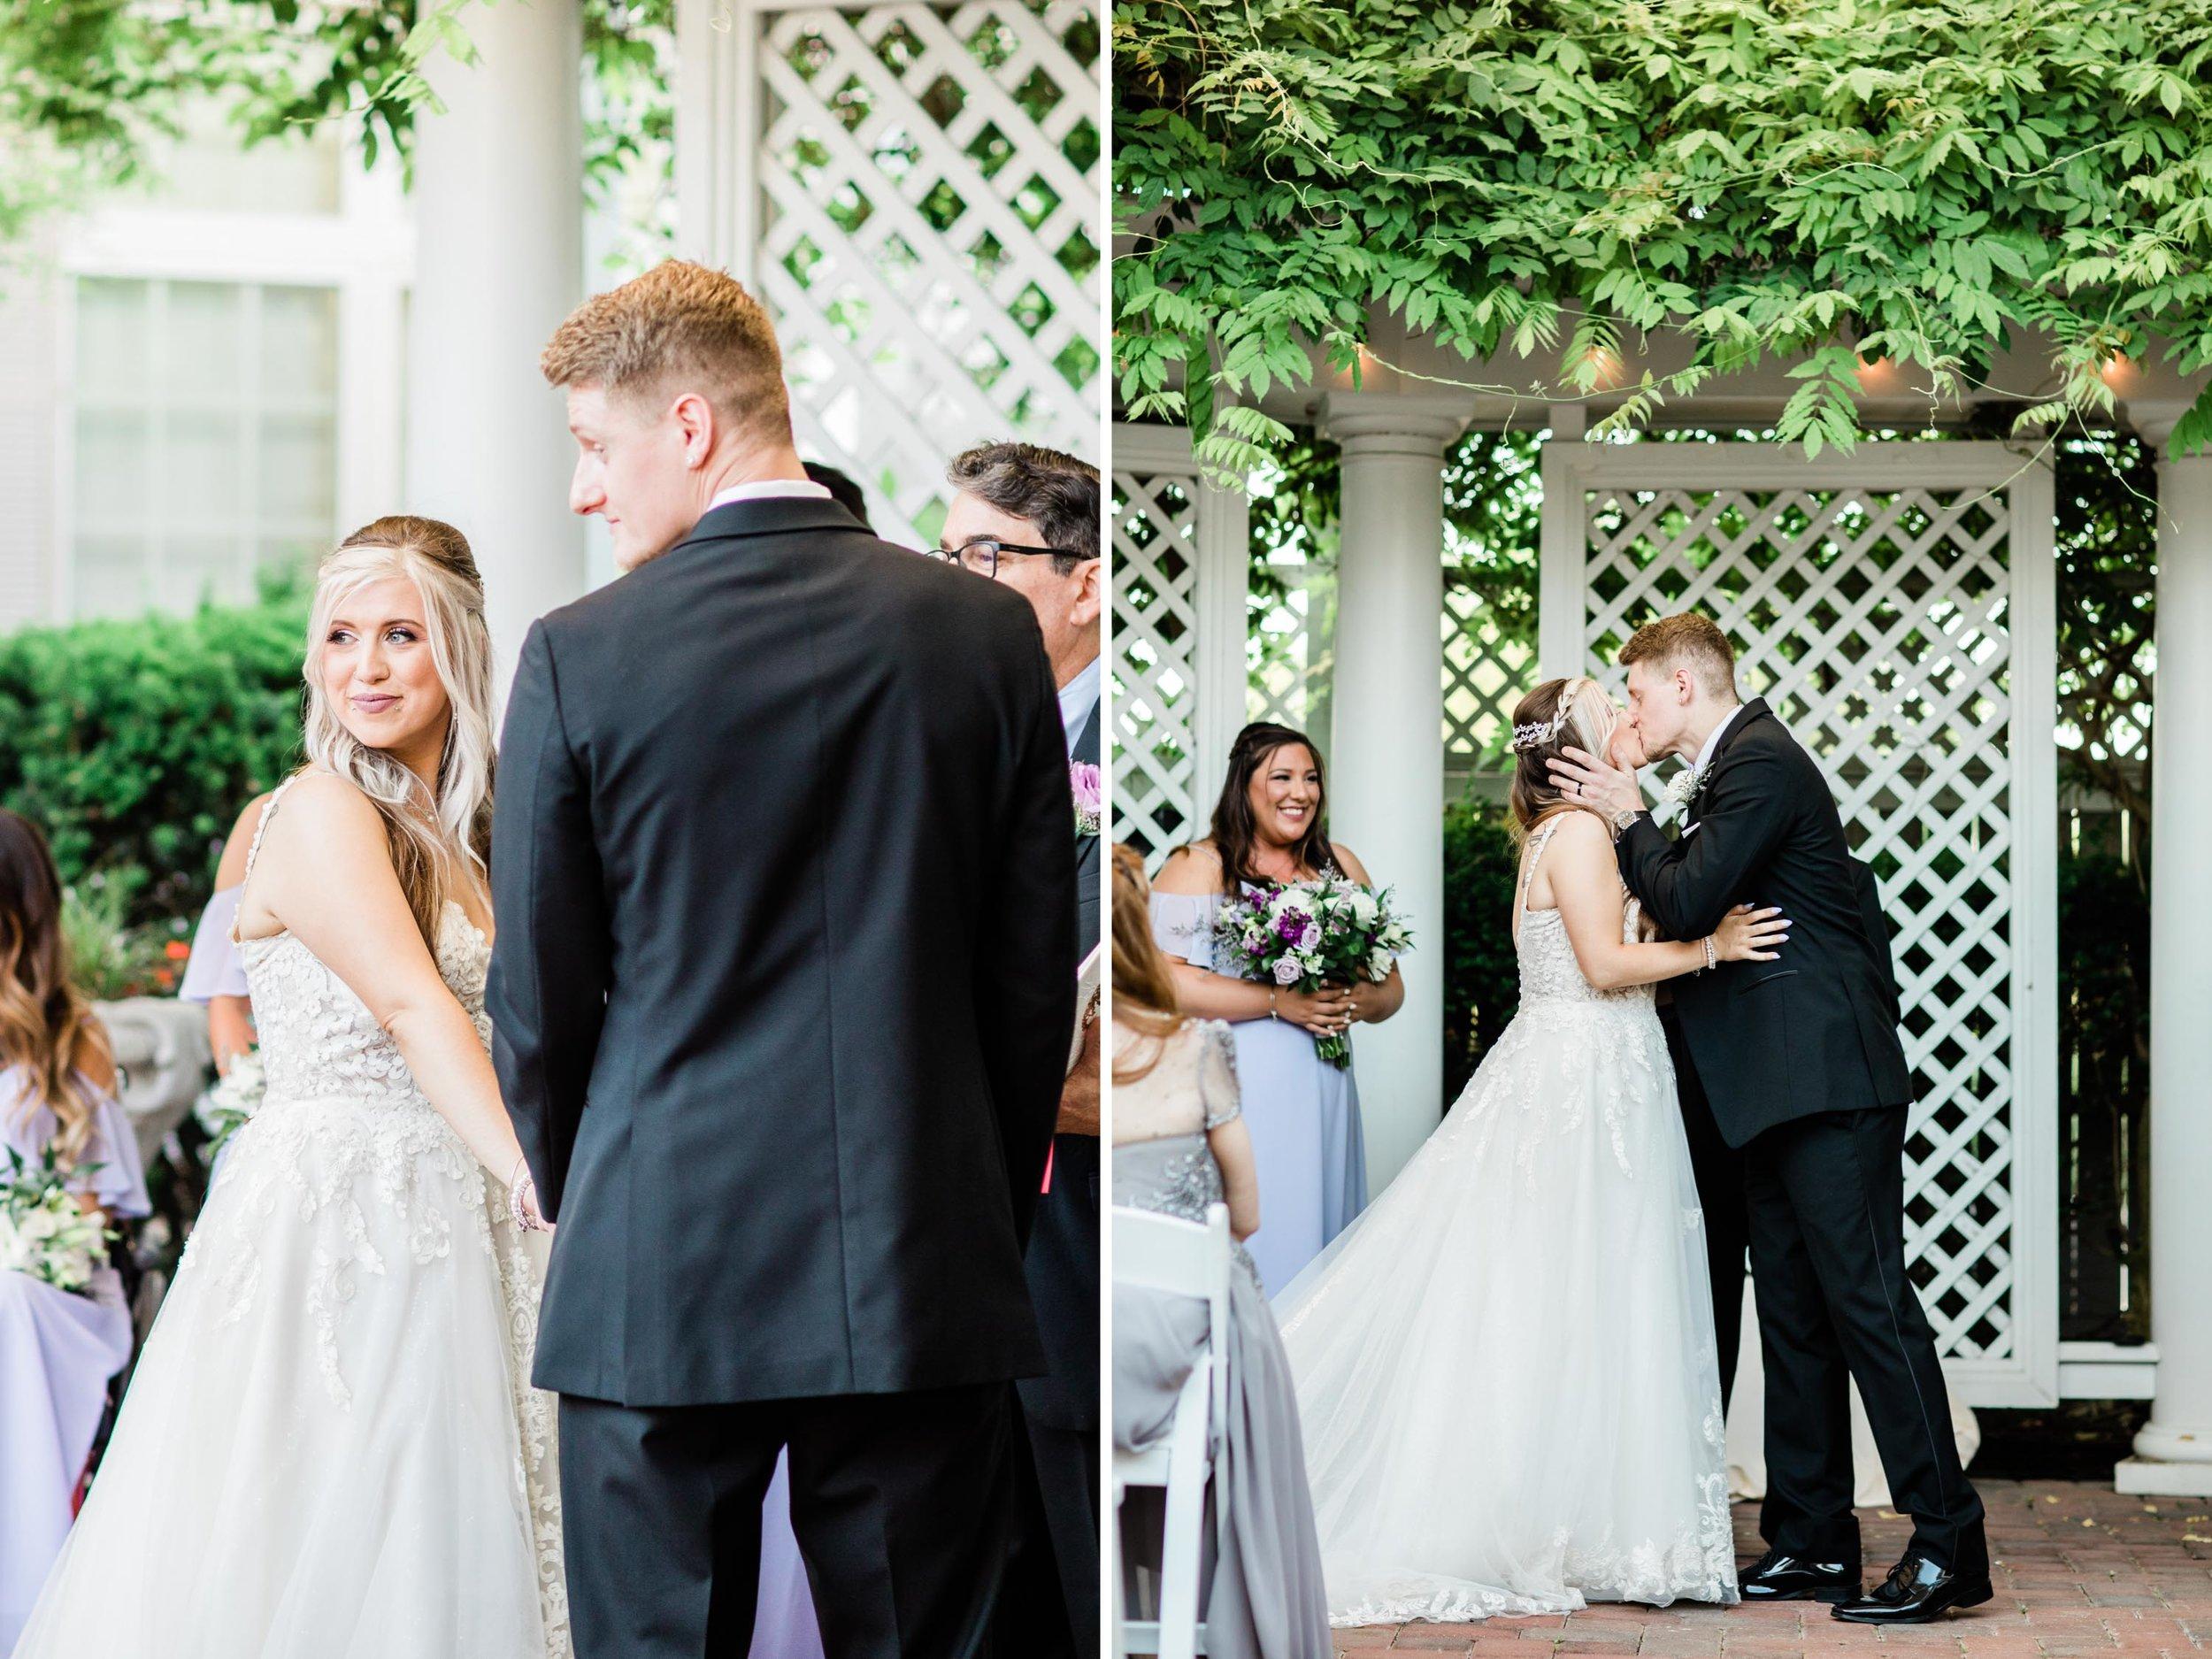 manor house courtyard wedding ceremony.jpg